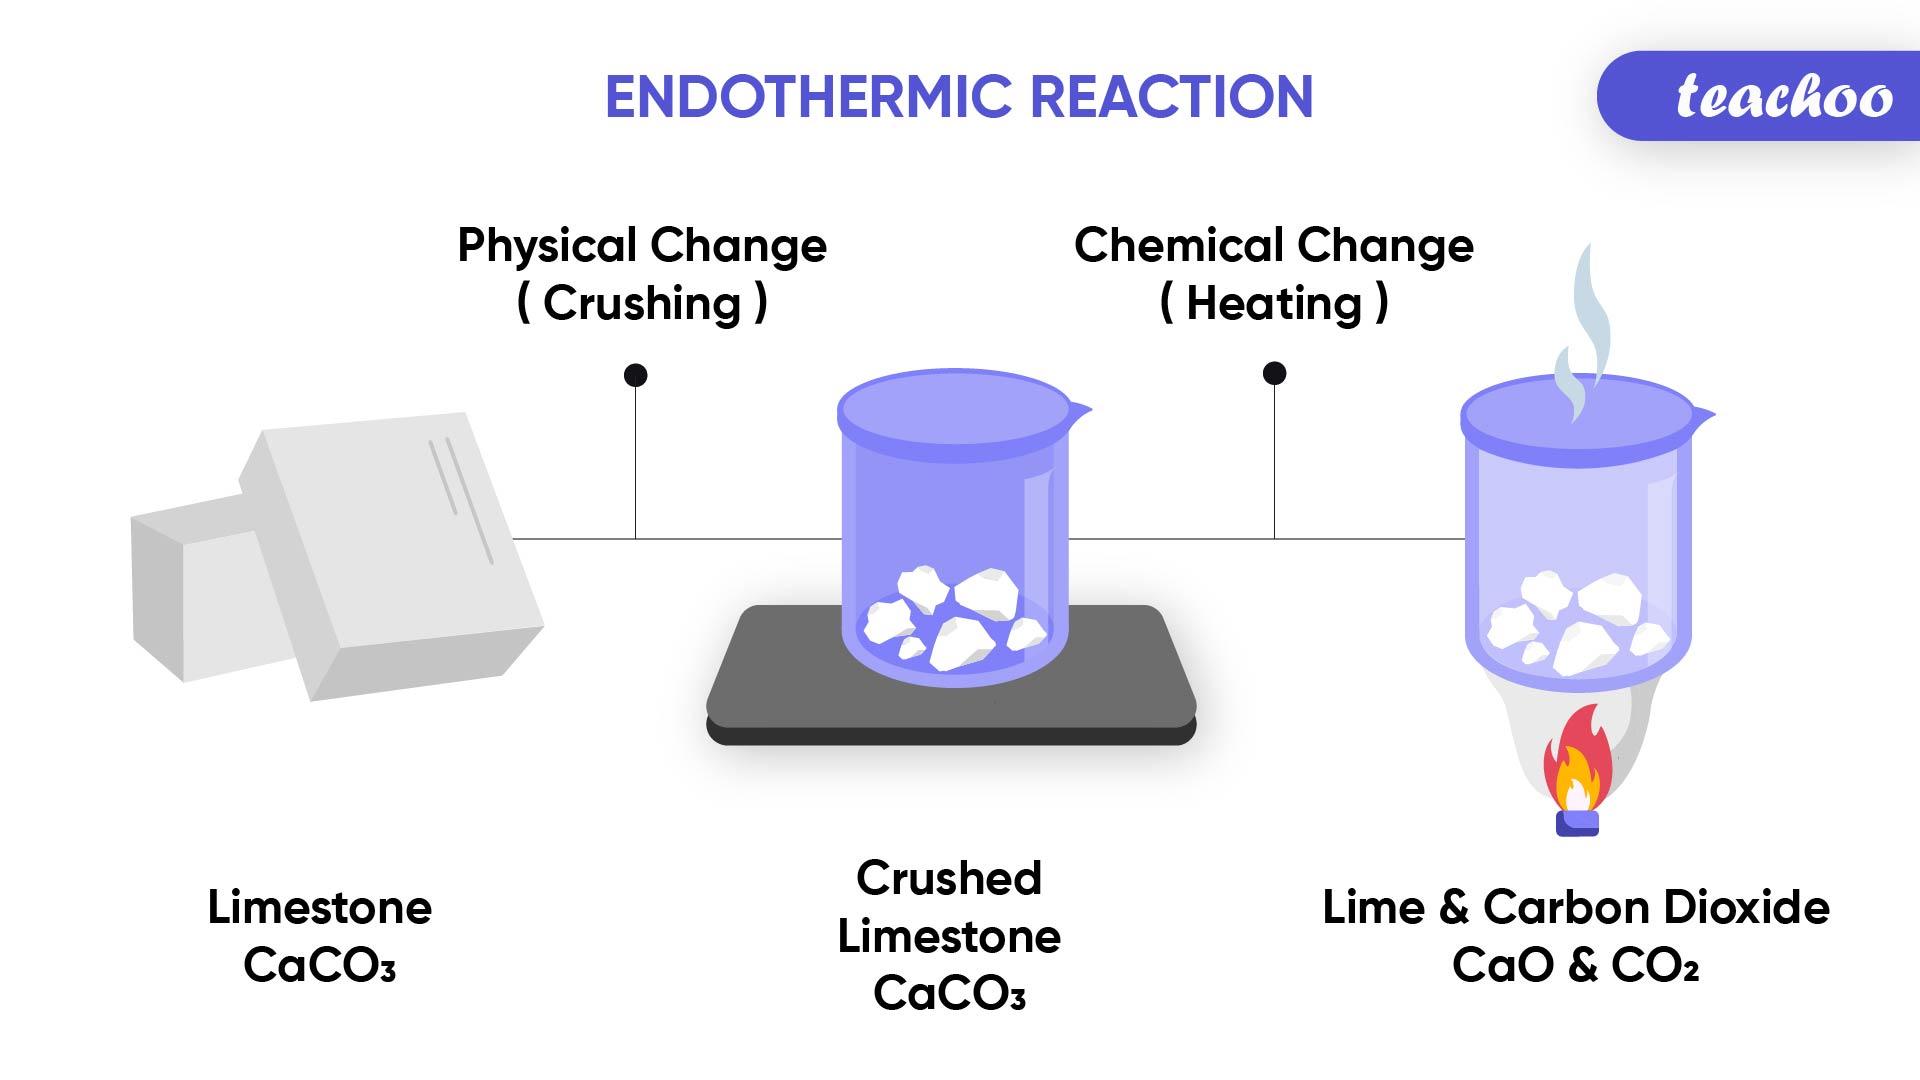 Endothermic Reaction-Teachoo-01.jpg